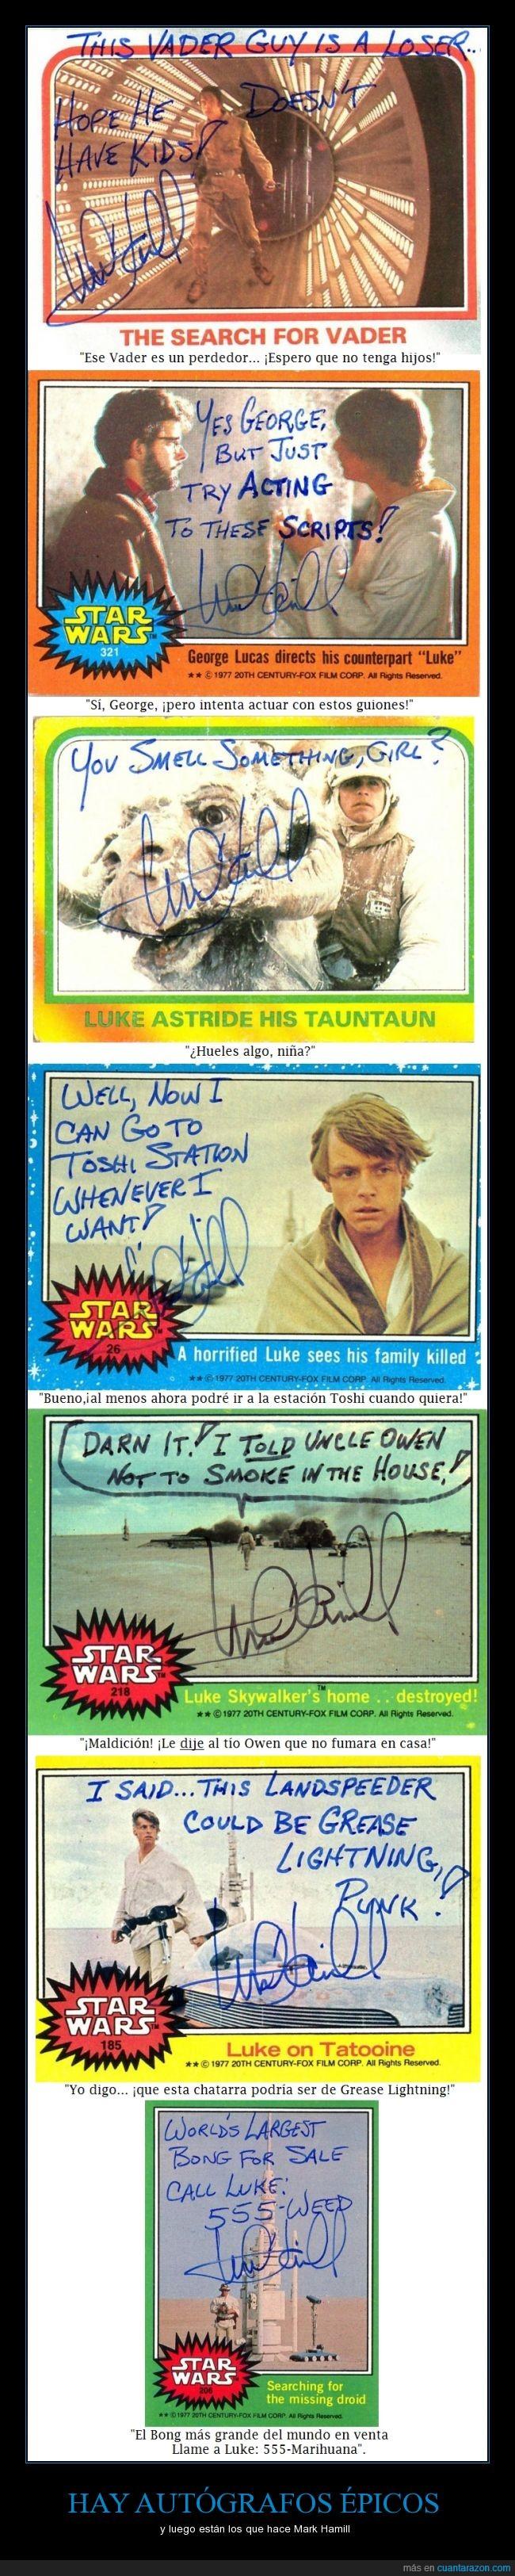 autógrafo,cromo/figurita,Episodio IV V VI,firma,George Lucas,humor,La Guerra de las Galaxias,Mark Hamill,parodia,Star Wars